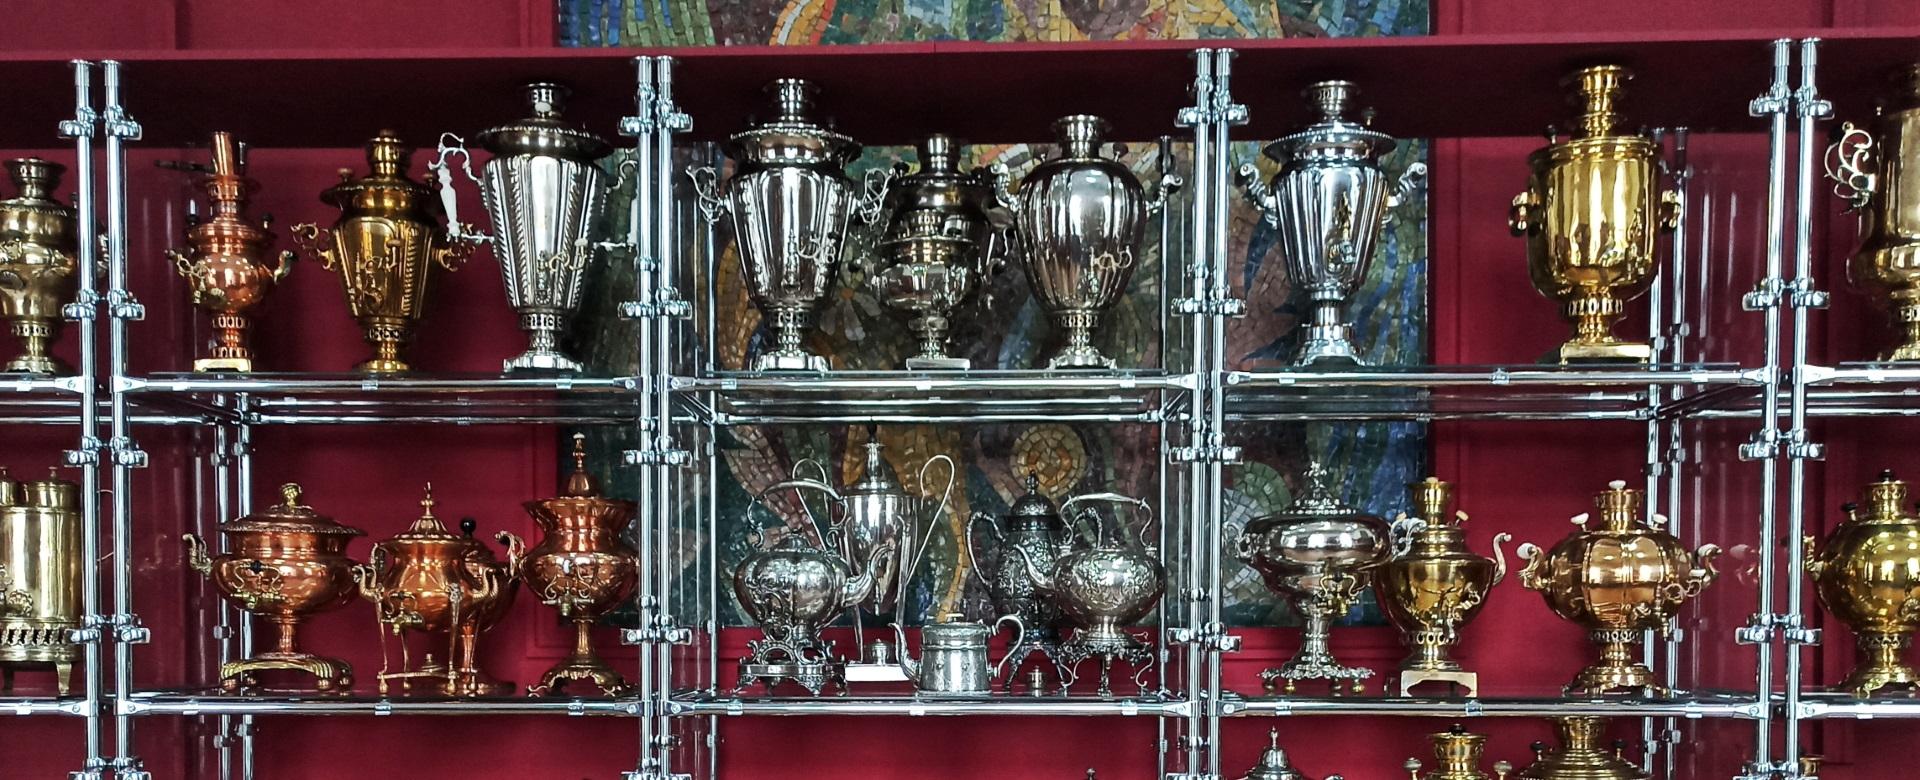 Выставка «Витязи русского стола»